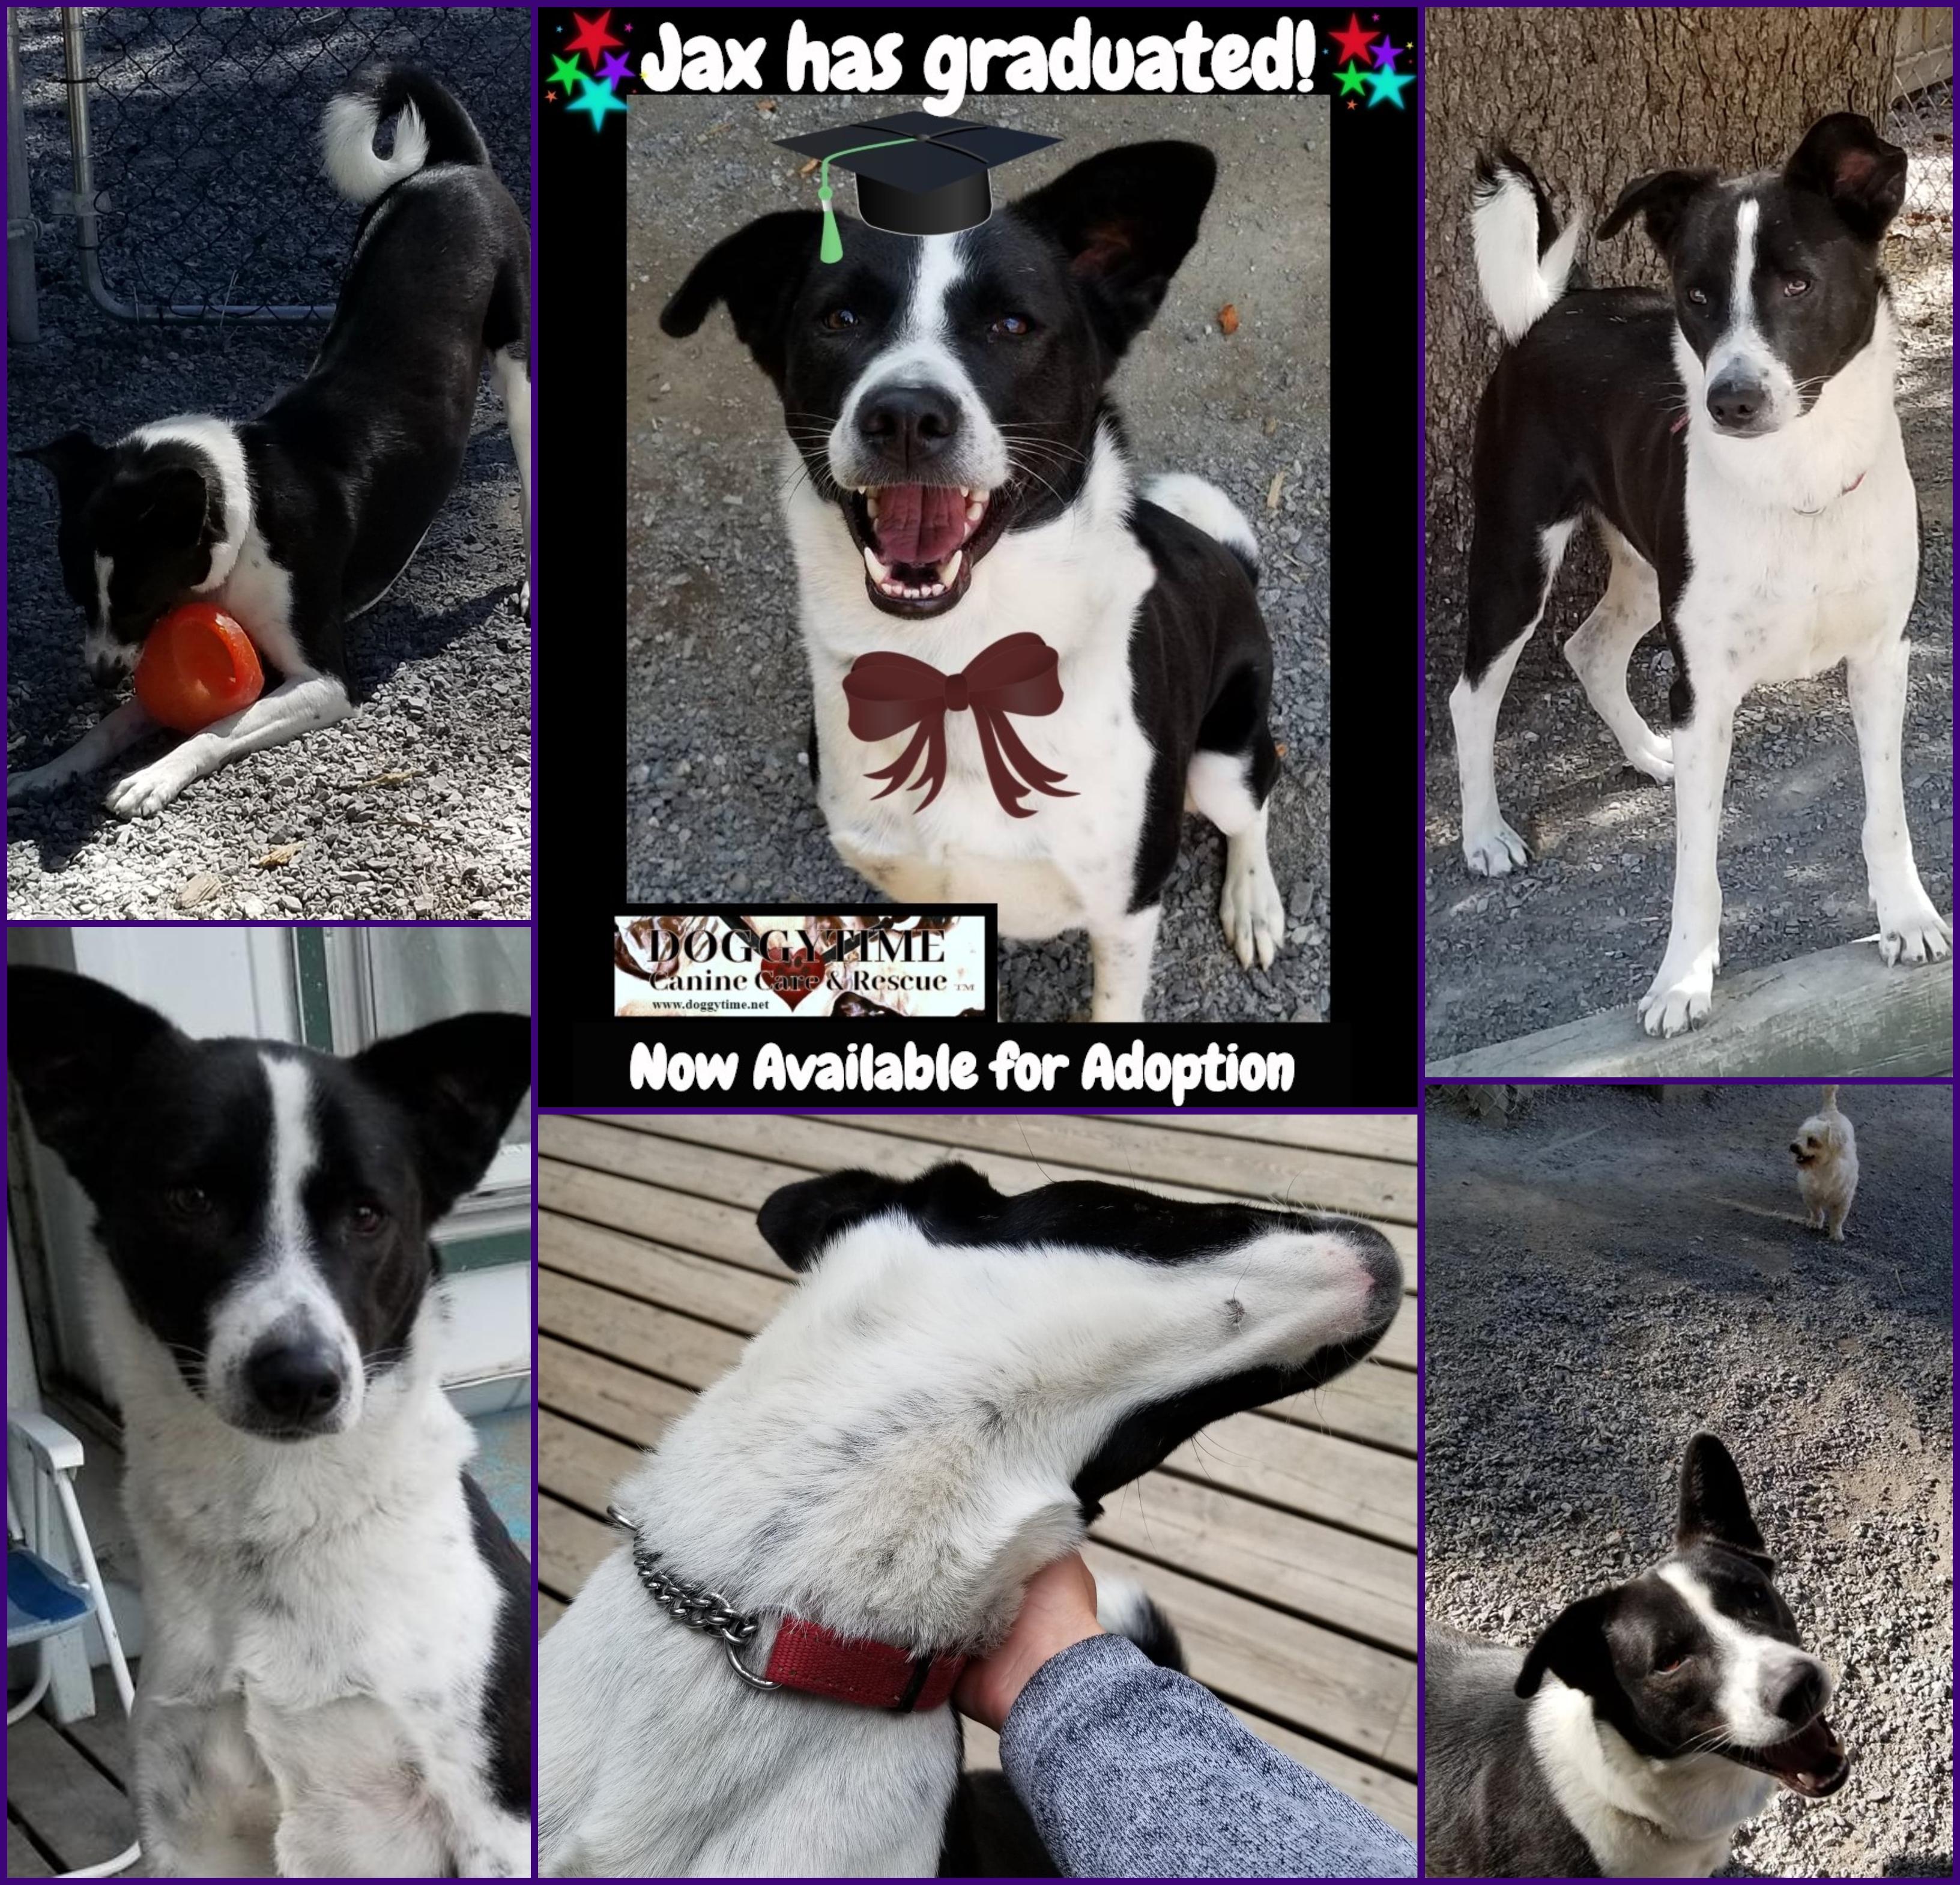 ♥ JAX'S DREAM ♥ | DOGGYTIME ~ Canine Care & Rescue™ ♥